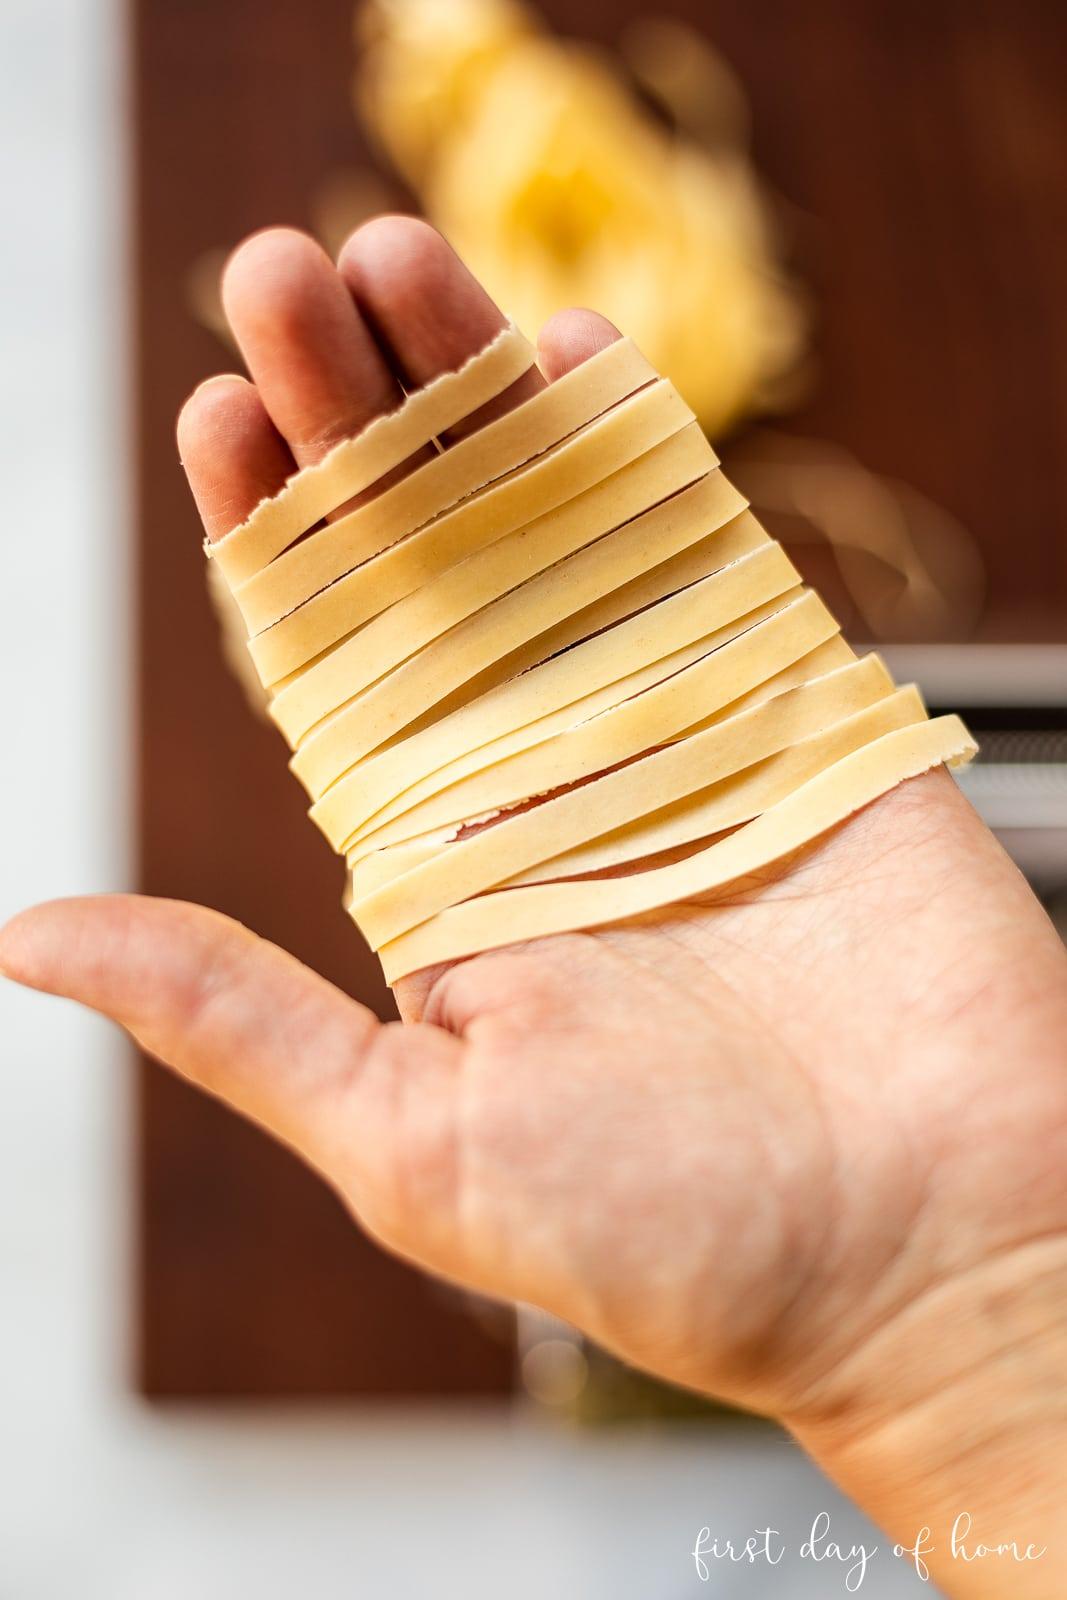 Pasta recipe cut into noodles